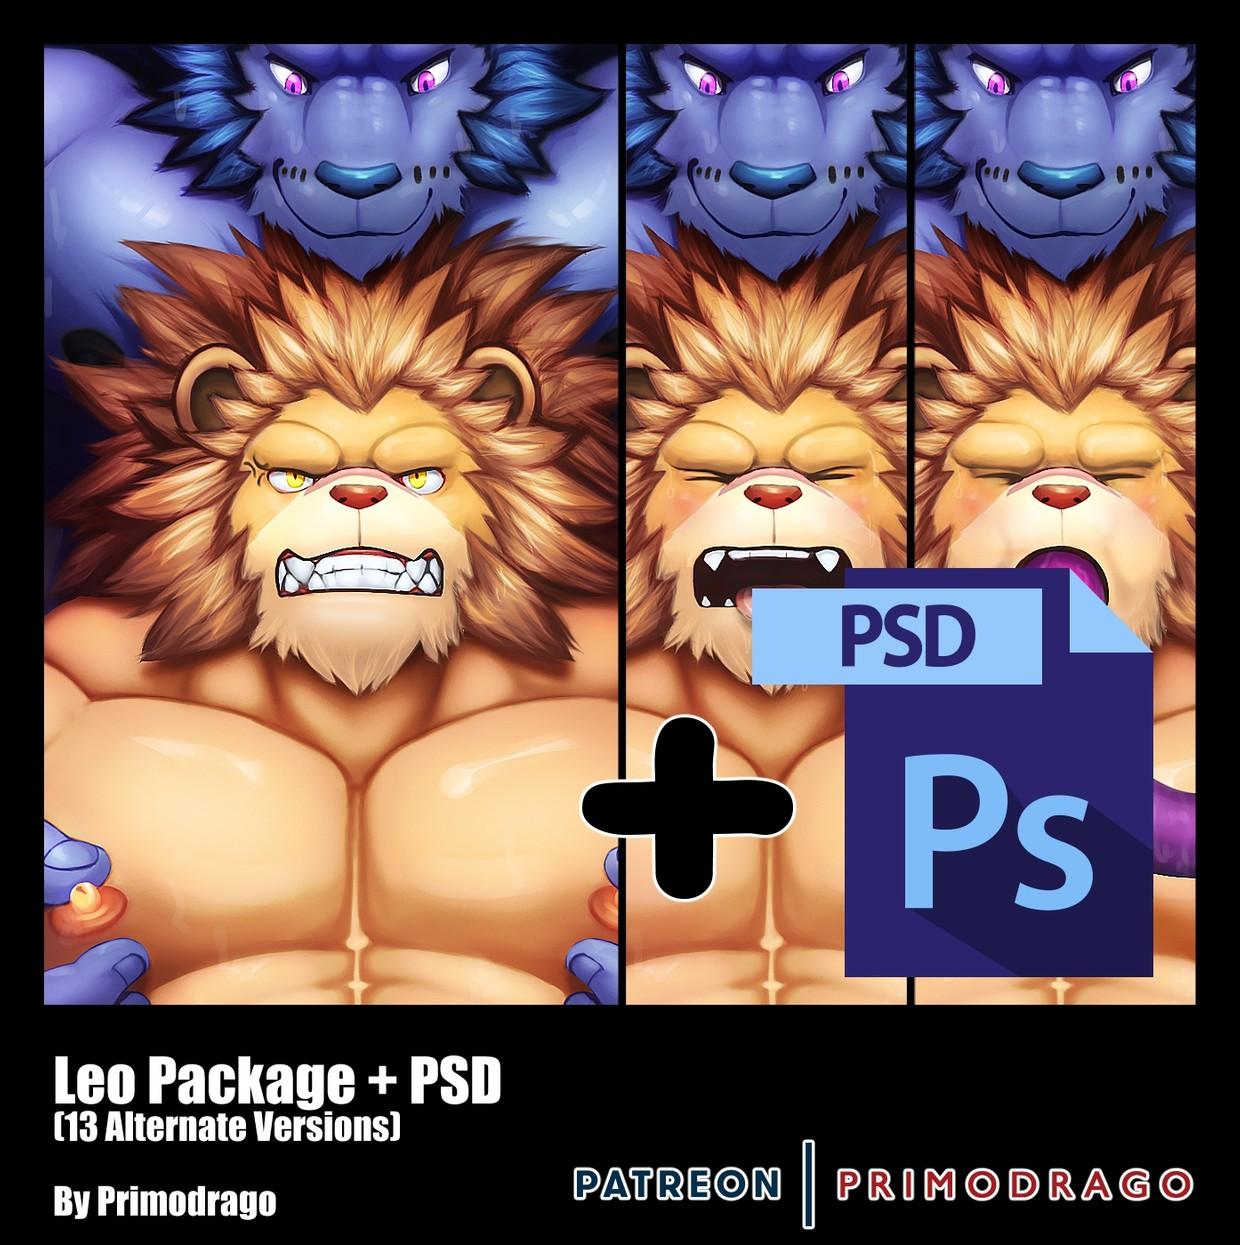 Leo Artpack + PSD File